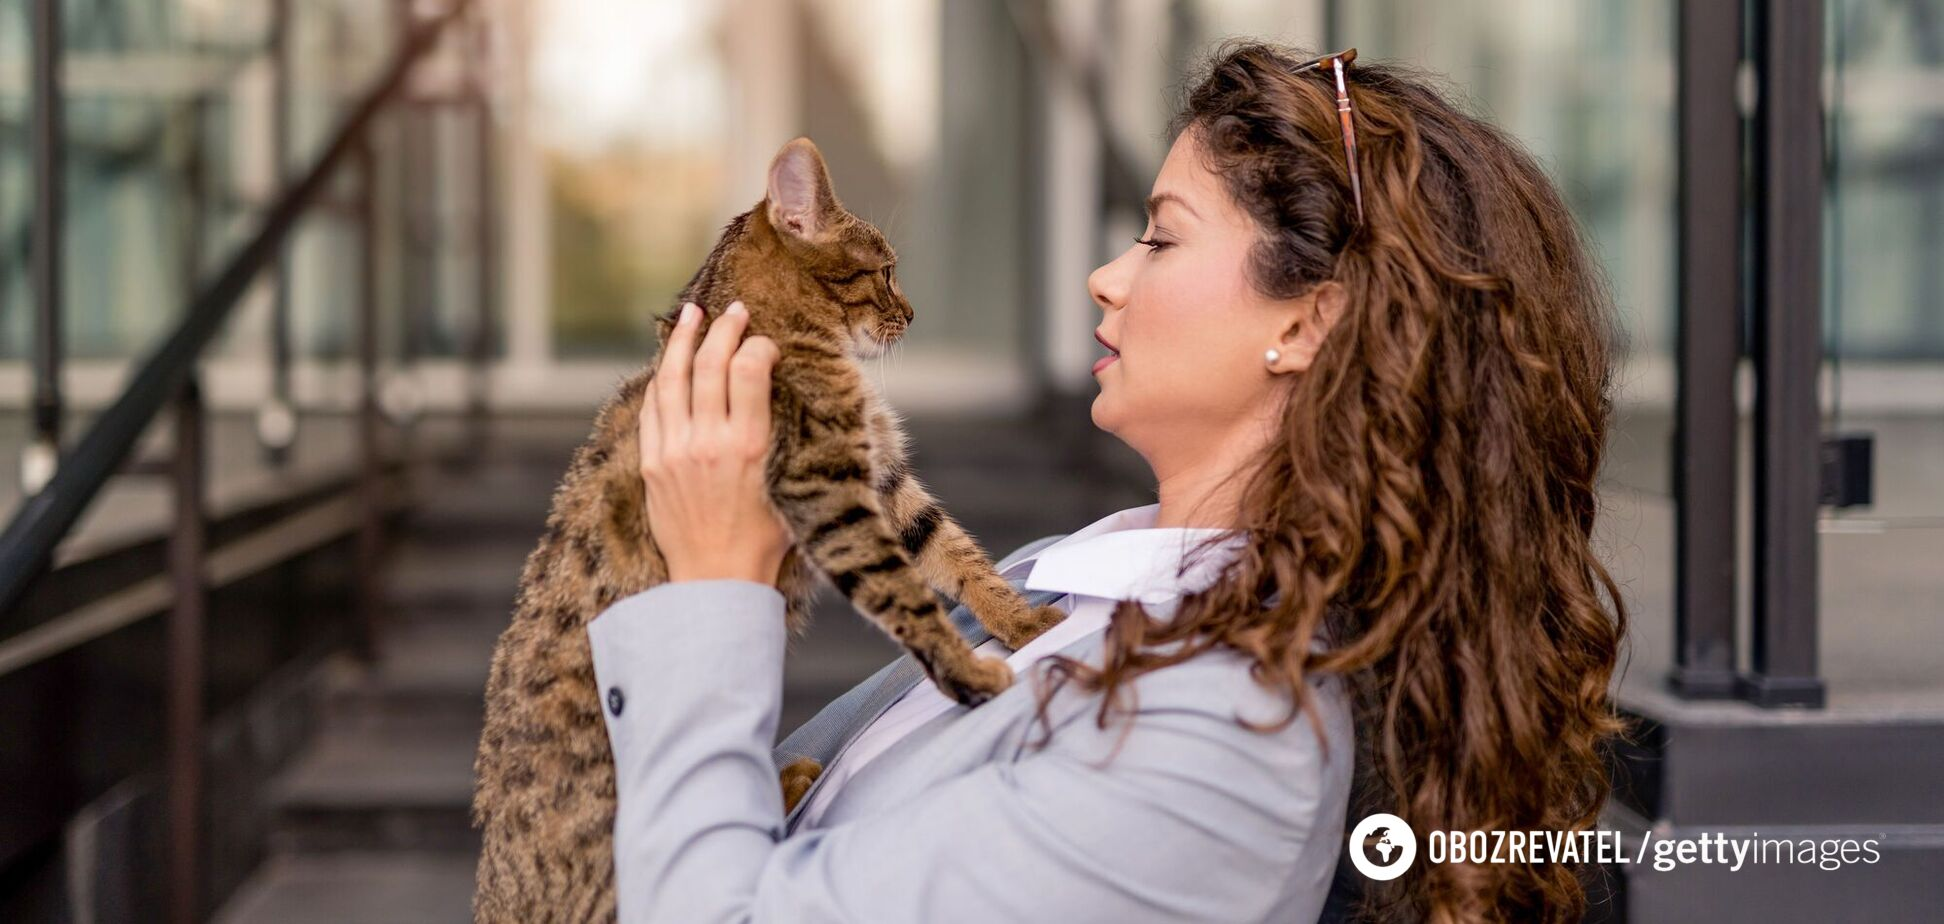 Кошки могут заразиться коронавирусом